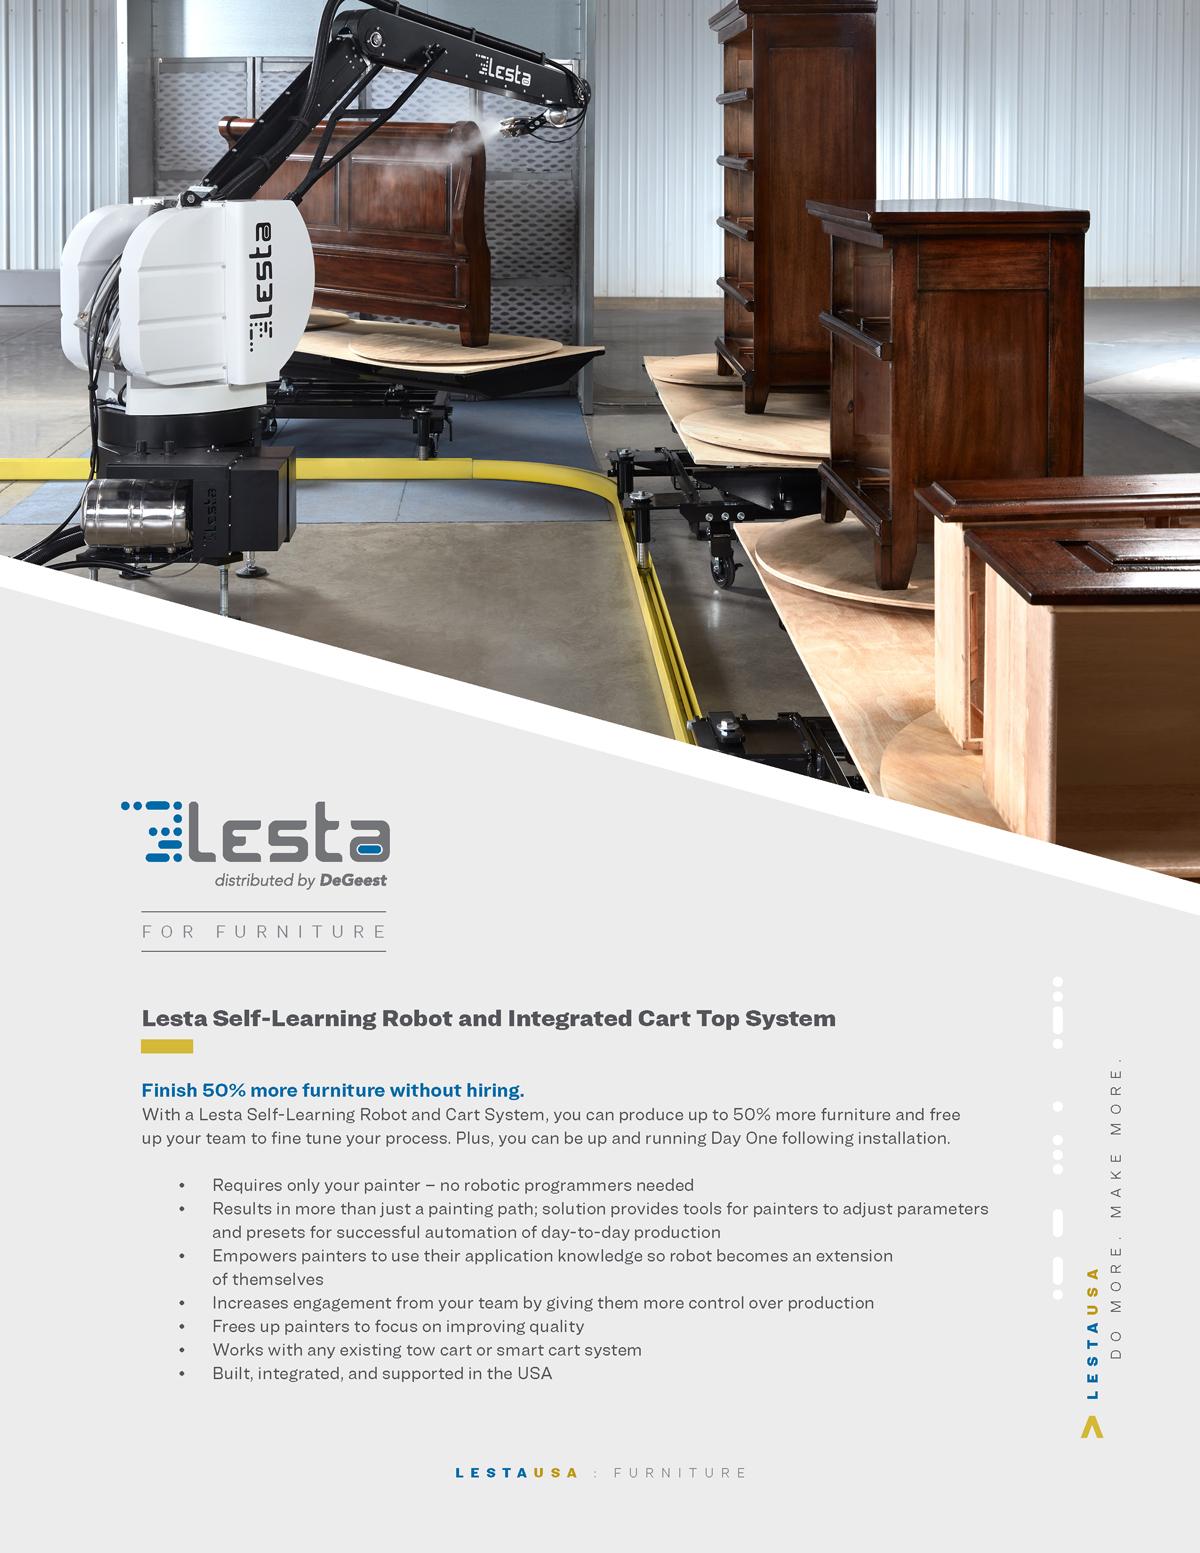 LestaUSA-For-Furniture